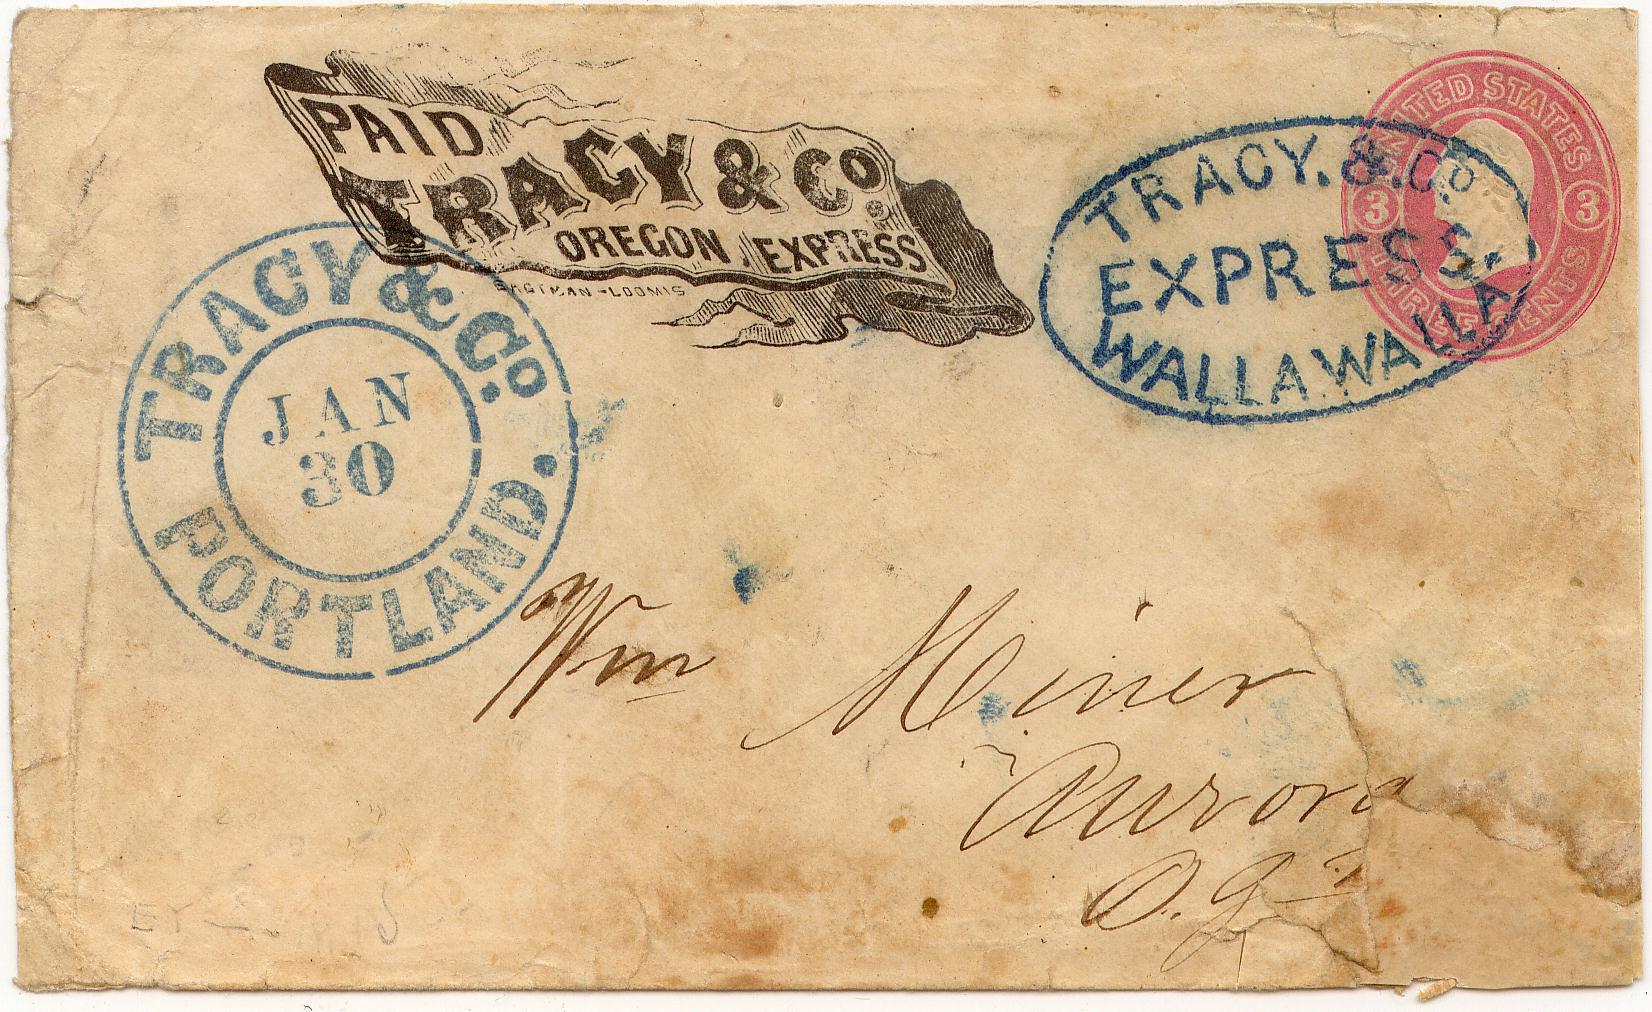 Tracys Hs Oval WallaWalla Blue 0903 Mader